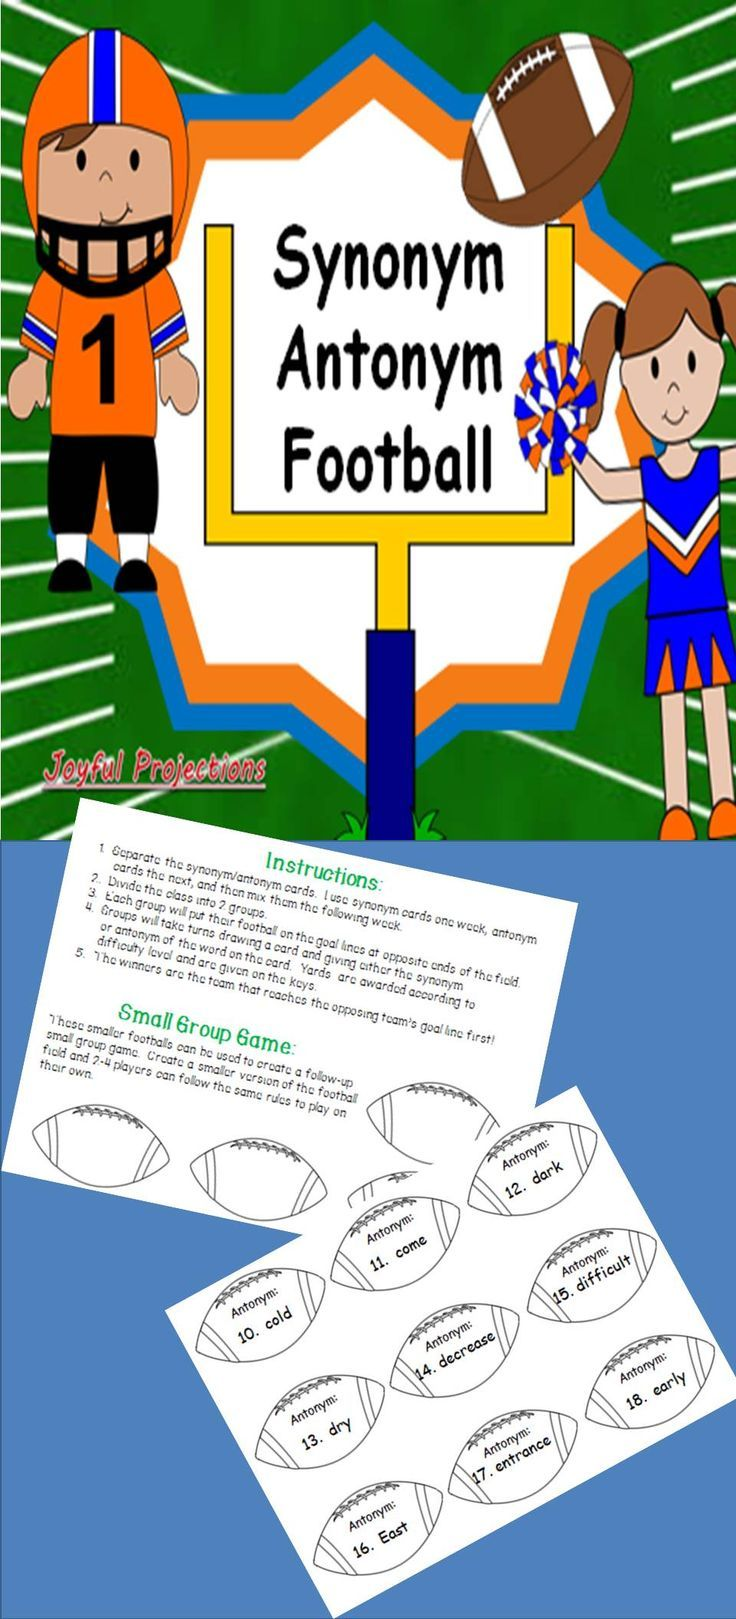 Synonym and Antonym Football (Classroom Vocab Activity)